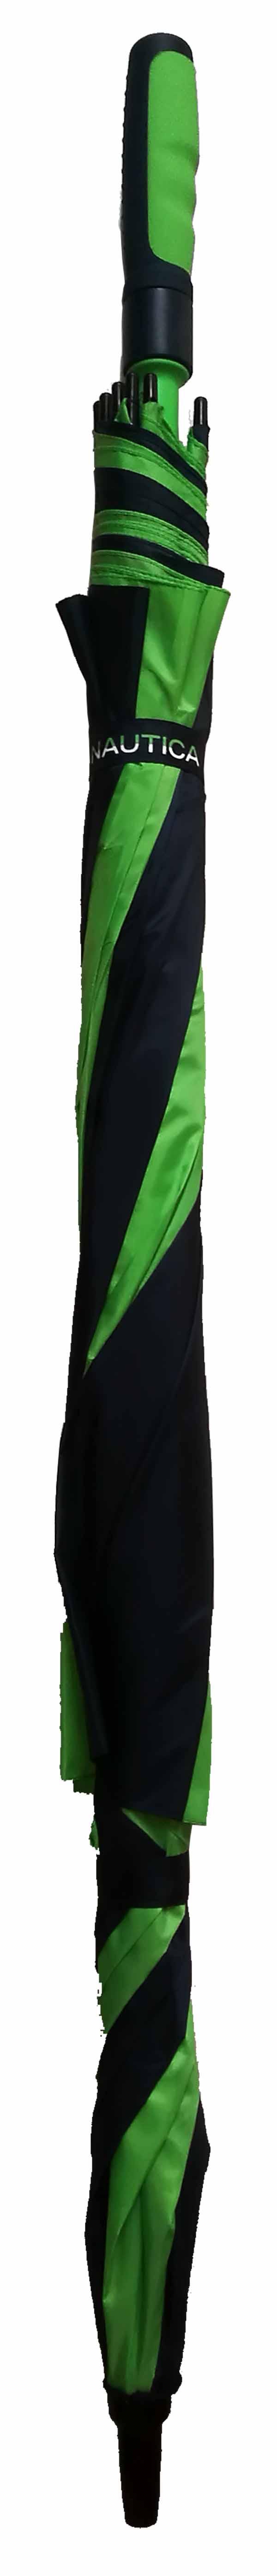 Sombrilla de golf Nautica verde 68 02